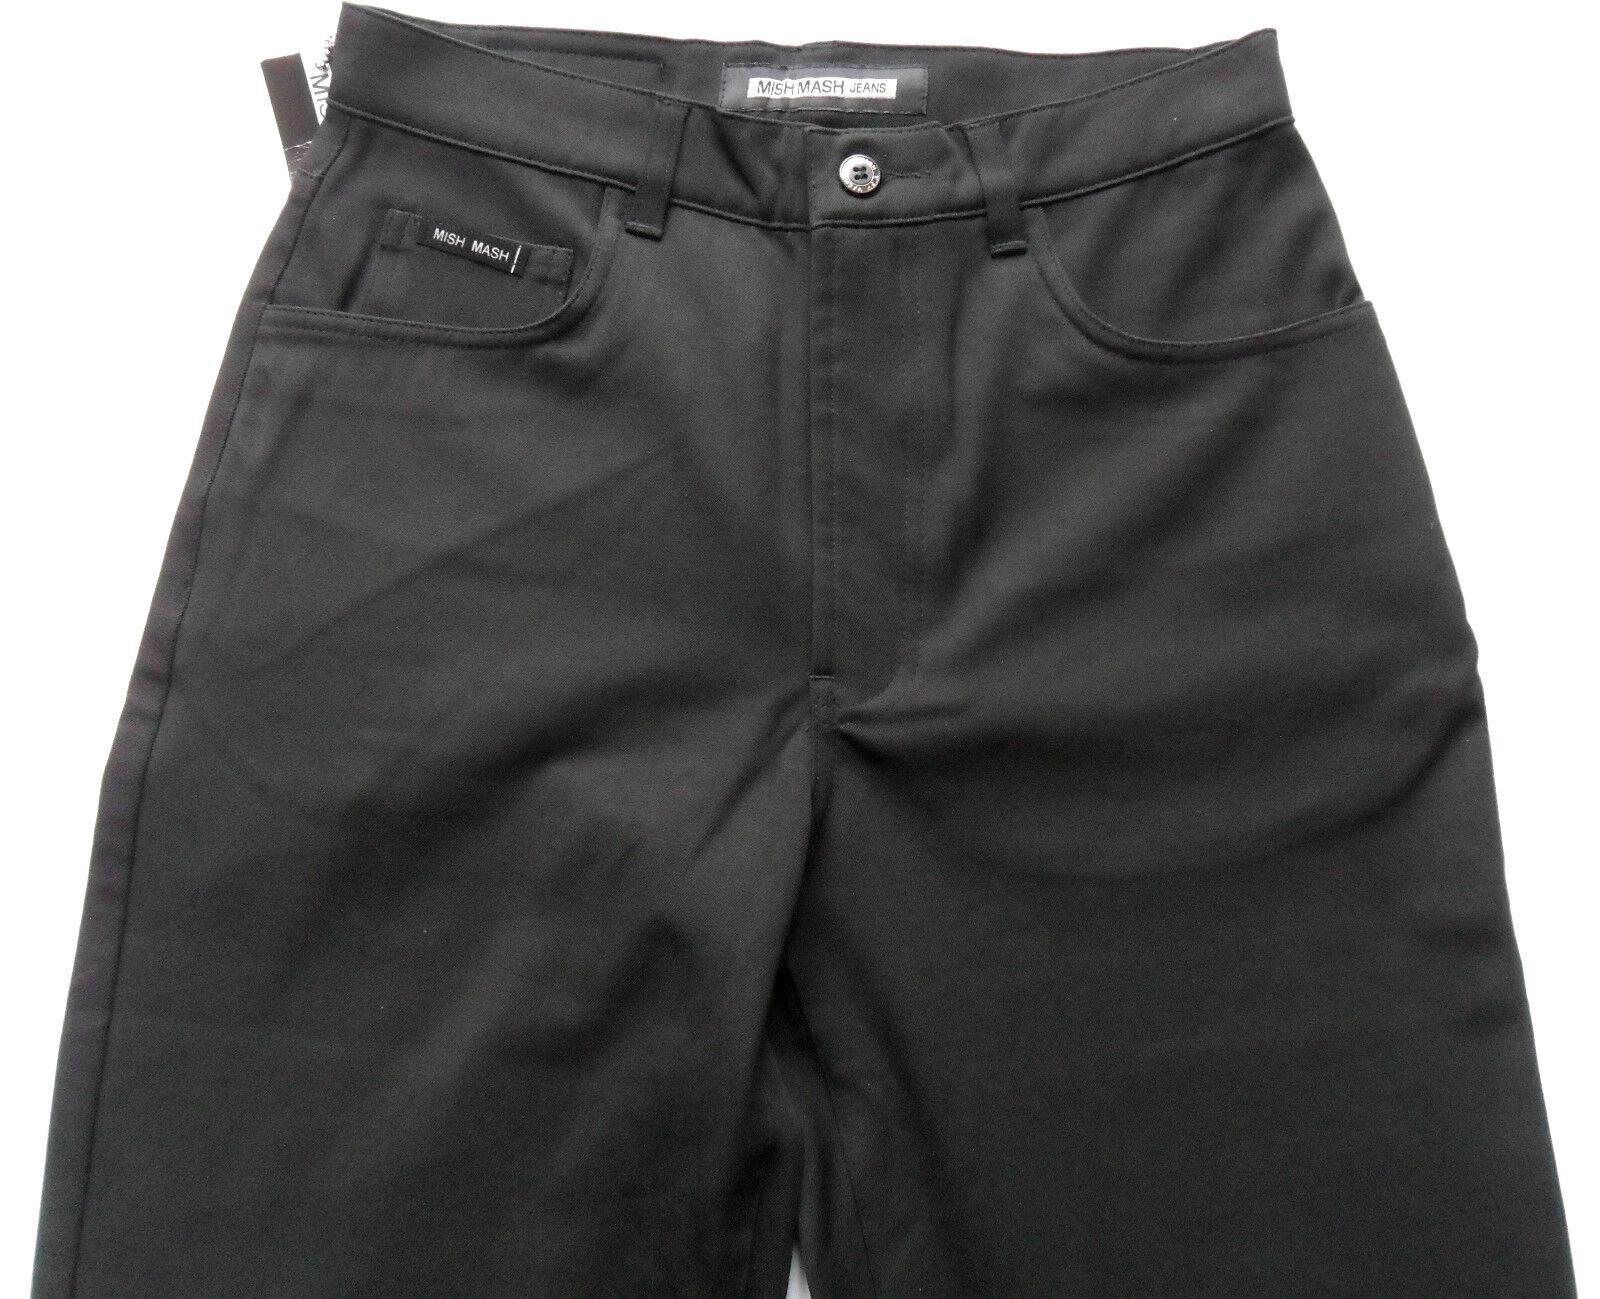 MISH MASH Mens Lycra Gaberdine Stretch Trousers Pants Navy Waist Waist Waist 28 30 32 34 36 943cb7